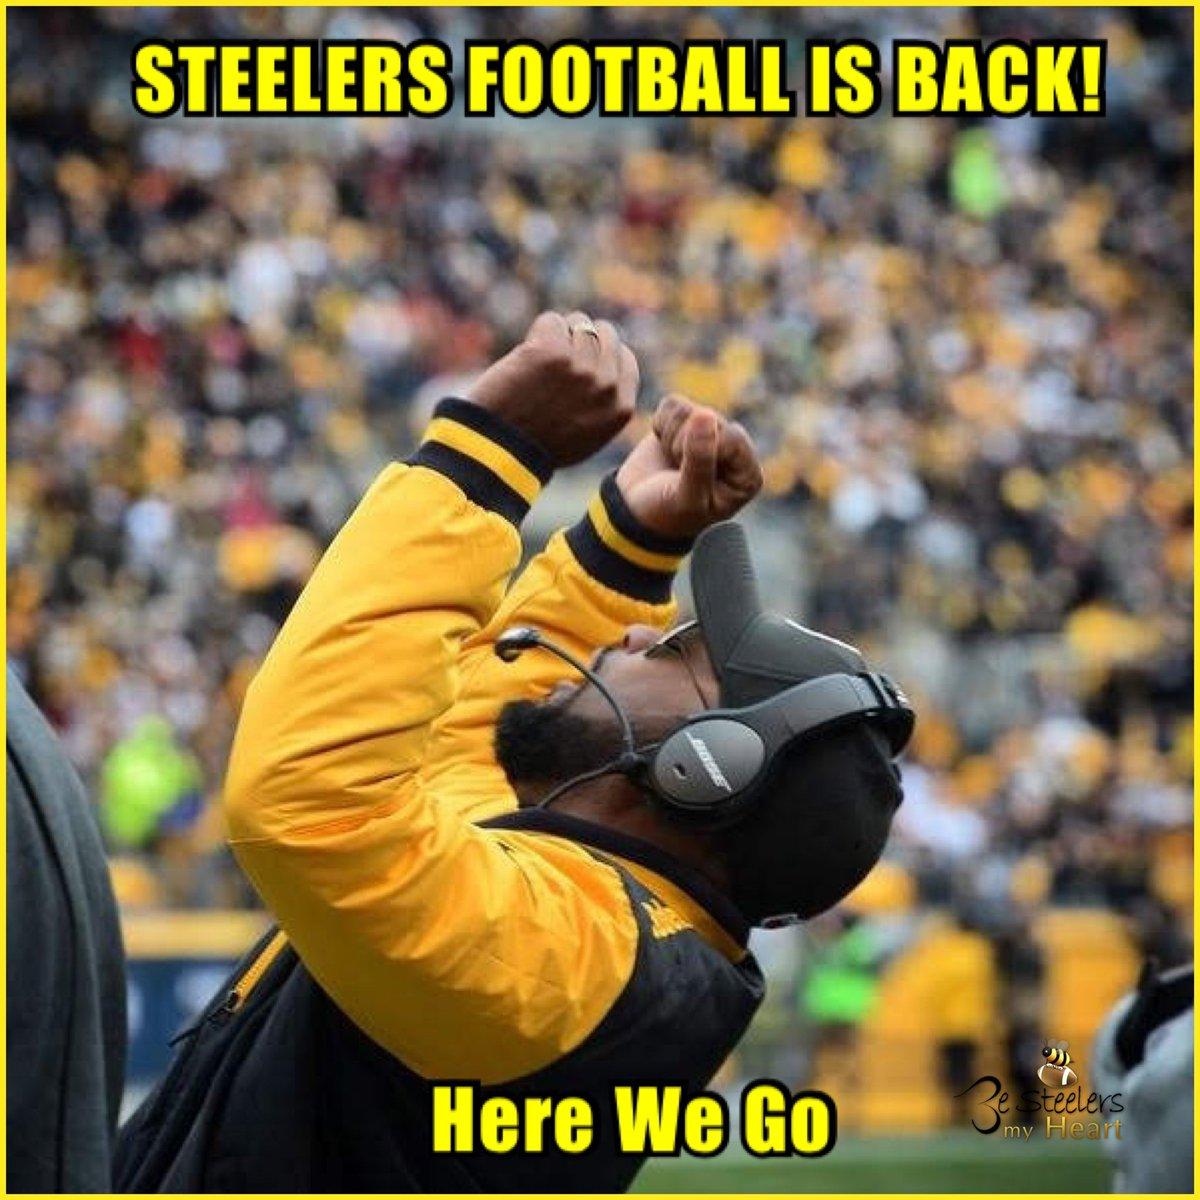 Yesssssss! 🙌🏾 It's really going down Steelersnation‼️ It's FINALLY GAMEDAY 👀 Here We Go Steelers 😆 #Steelers #HereWeGo Steelers